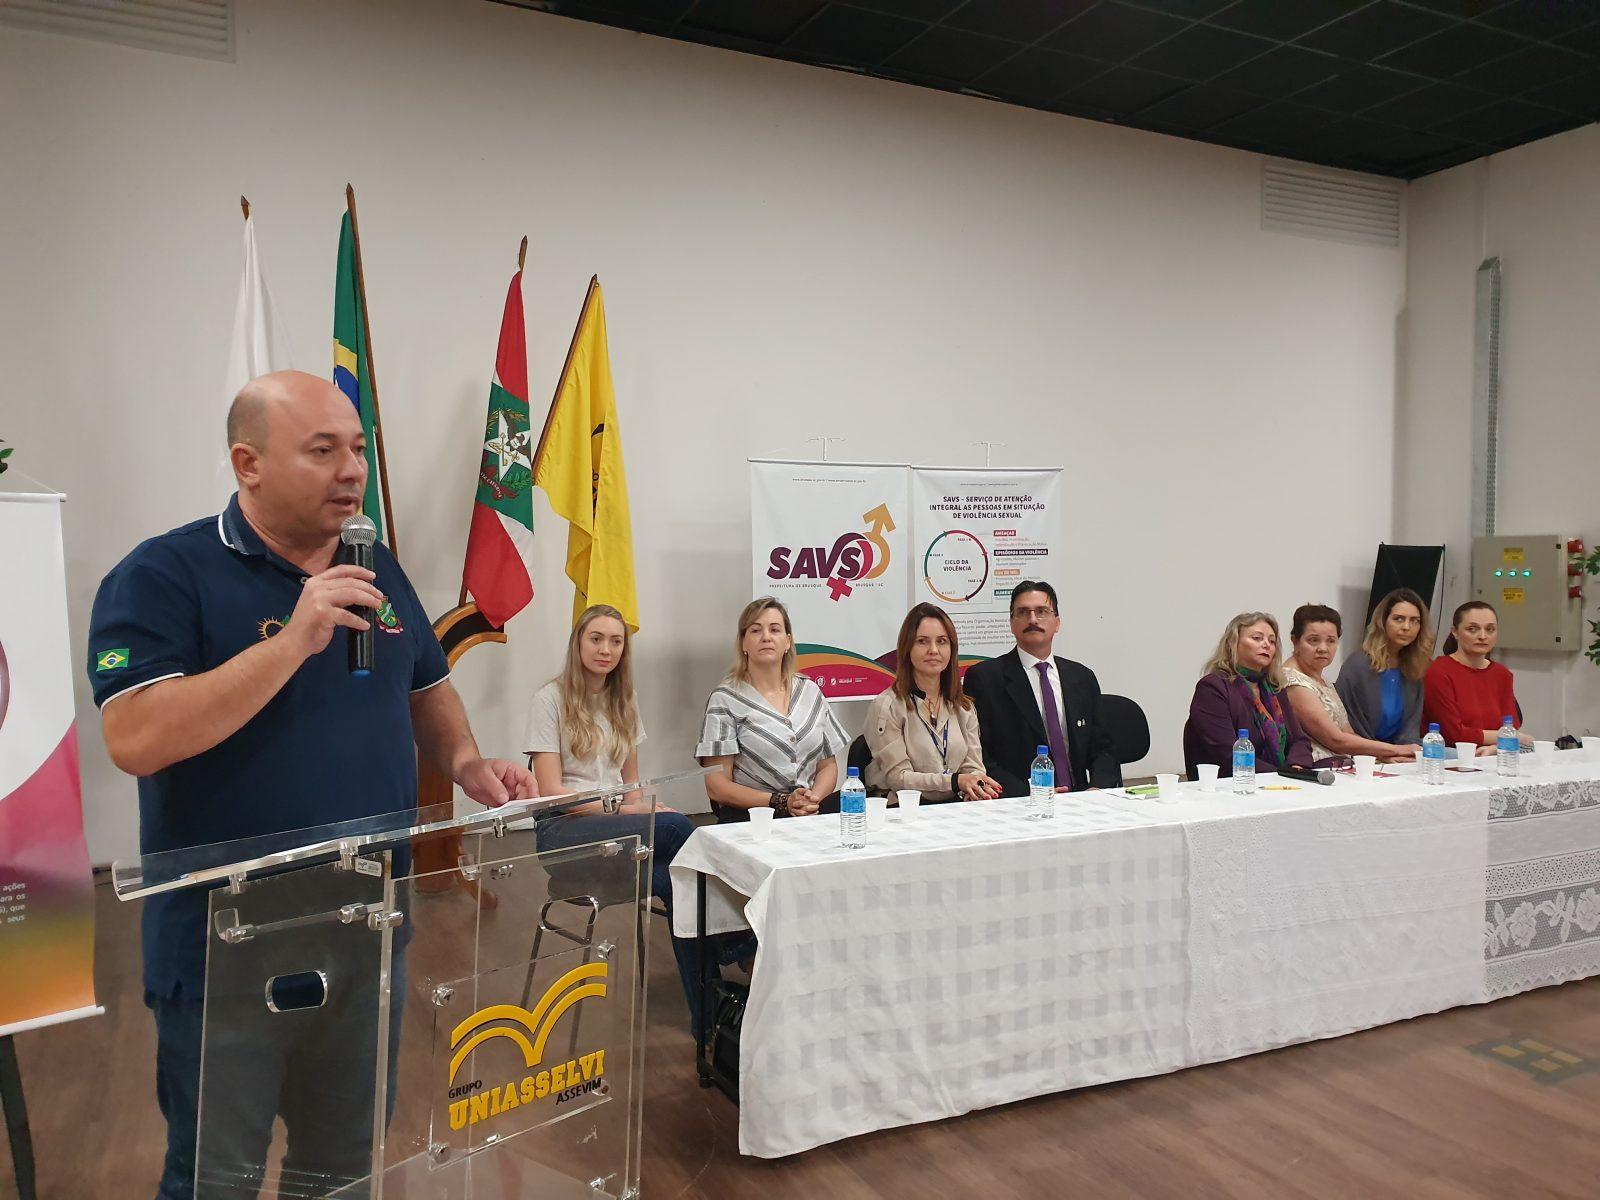 Serviço de atendimento as vítimas de violência sexual de Brusque inicia as atividades